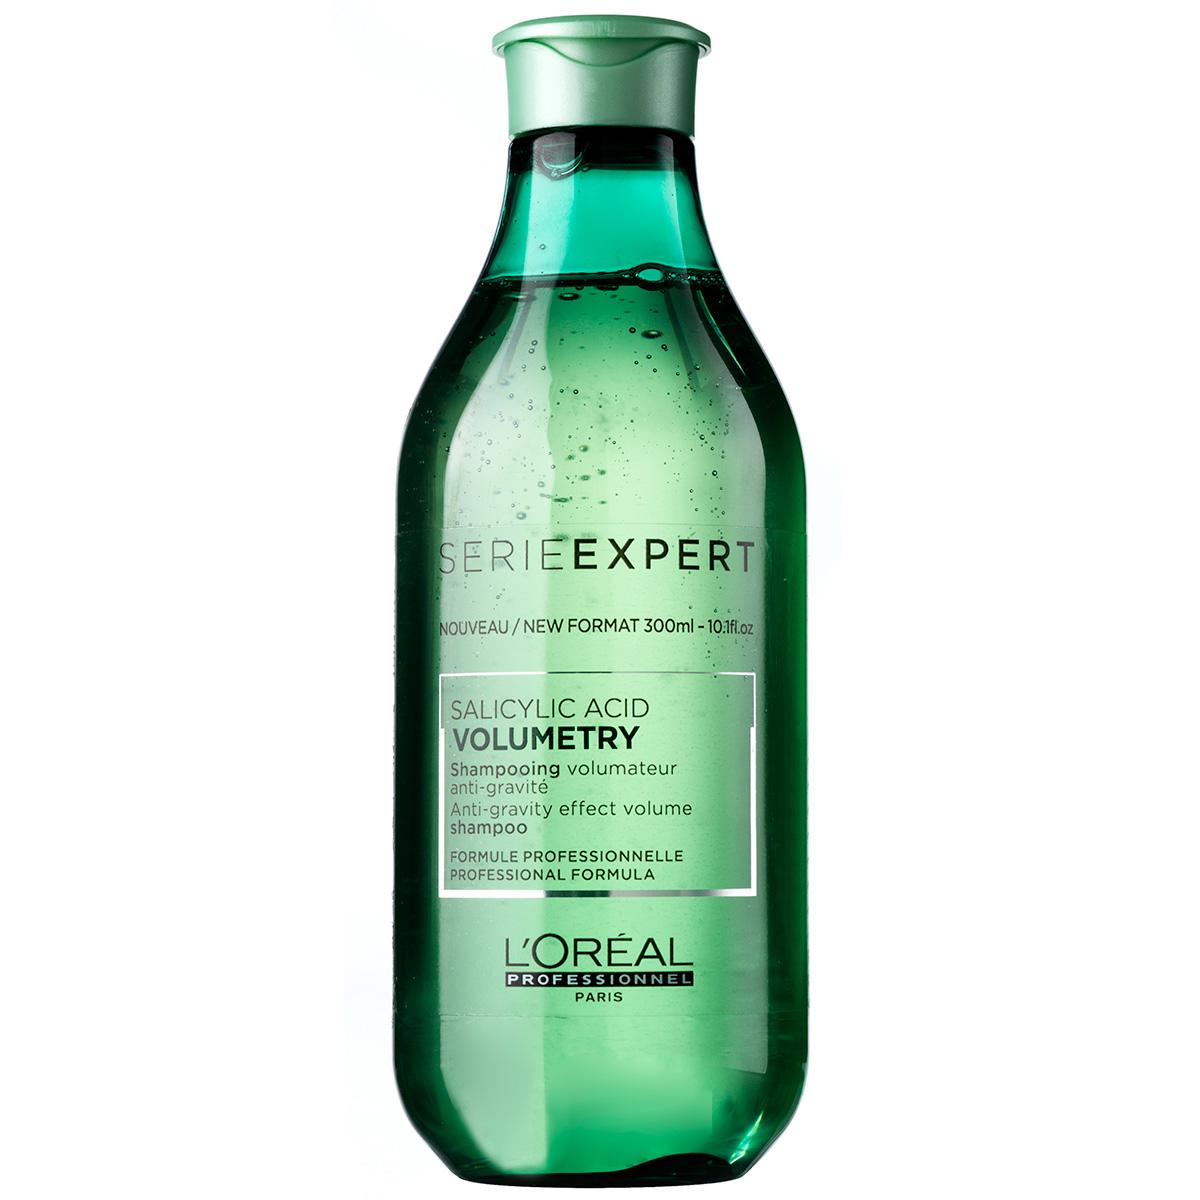 LOréal Série Expert Volumentry Salicylic Acid Shampoo - 300 ml